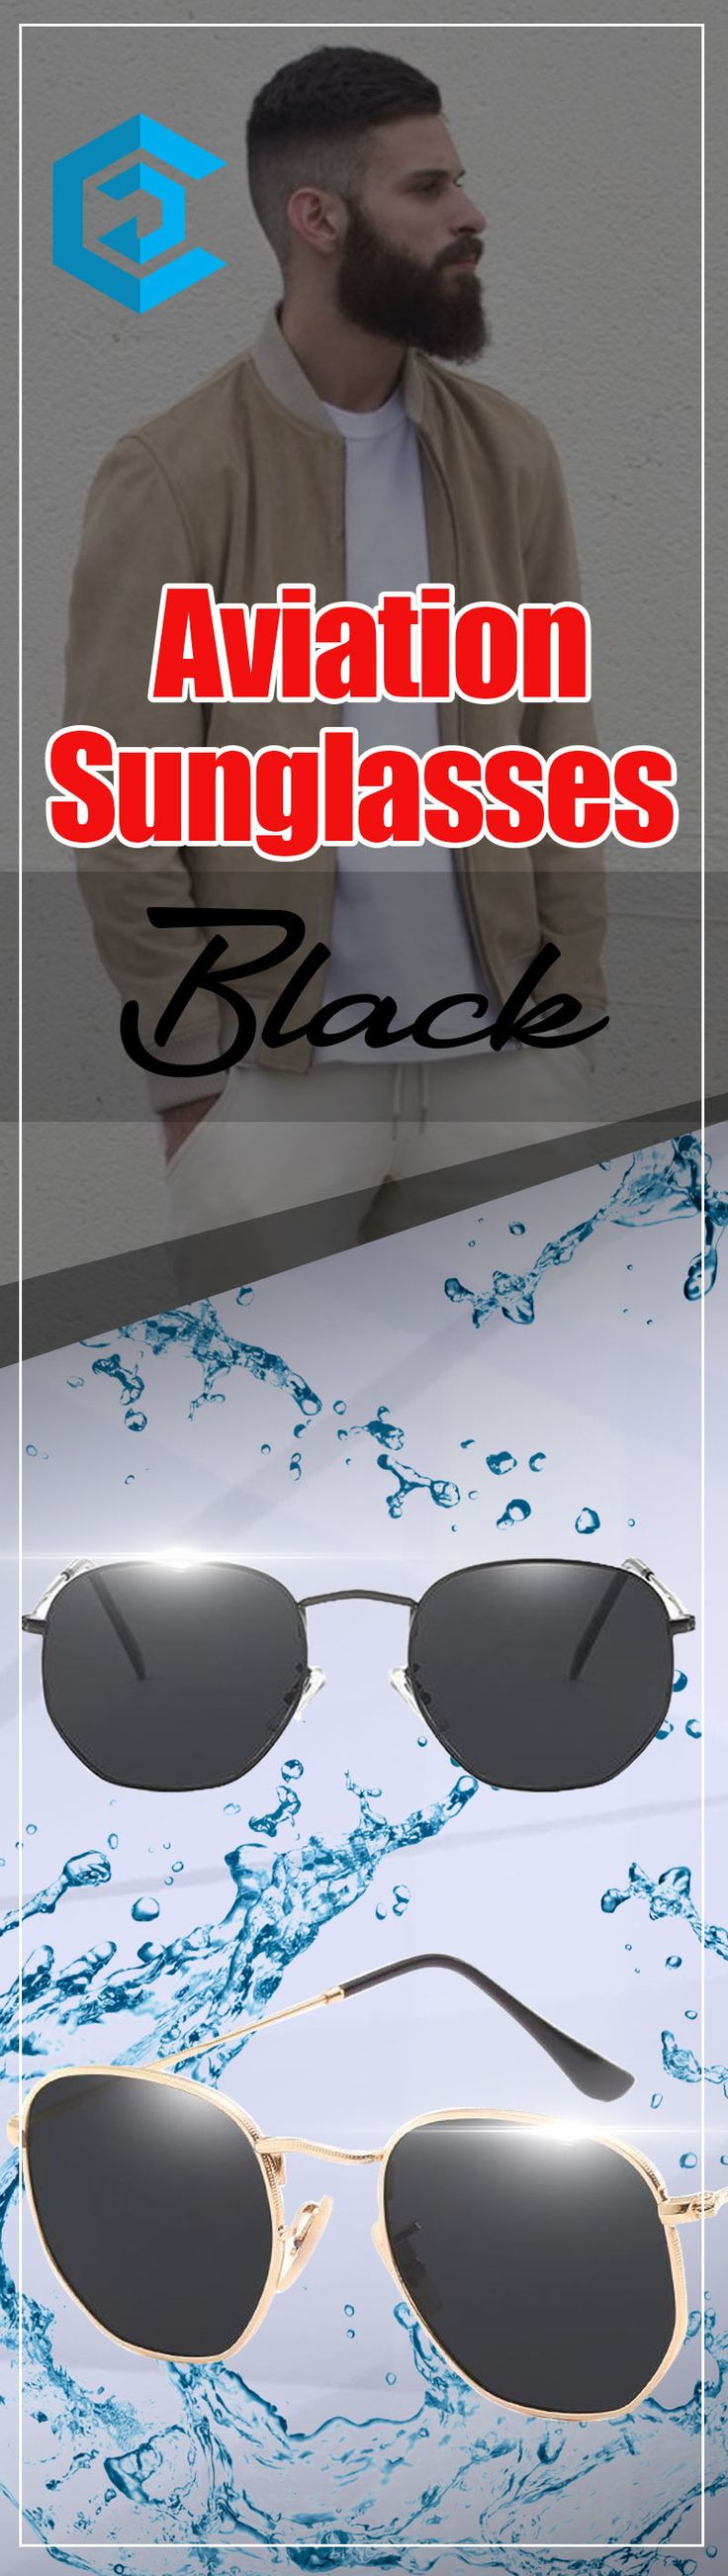 Aviation Sunglasses |2017| |fashion| |casual| |aviators| |round| |style| |popular| |brands| |polarized| |sport| |designer| |classic| |affordable| |classy| |guys| |summer| |beach| #sunglasses